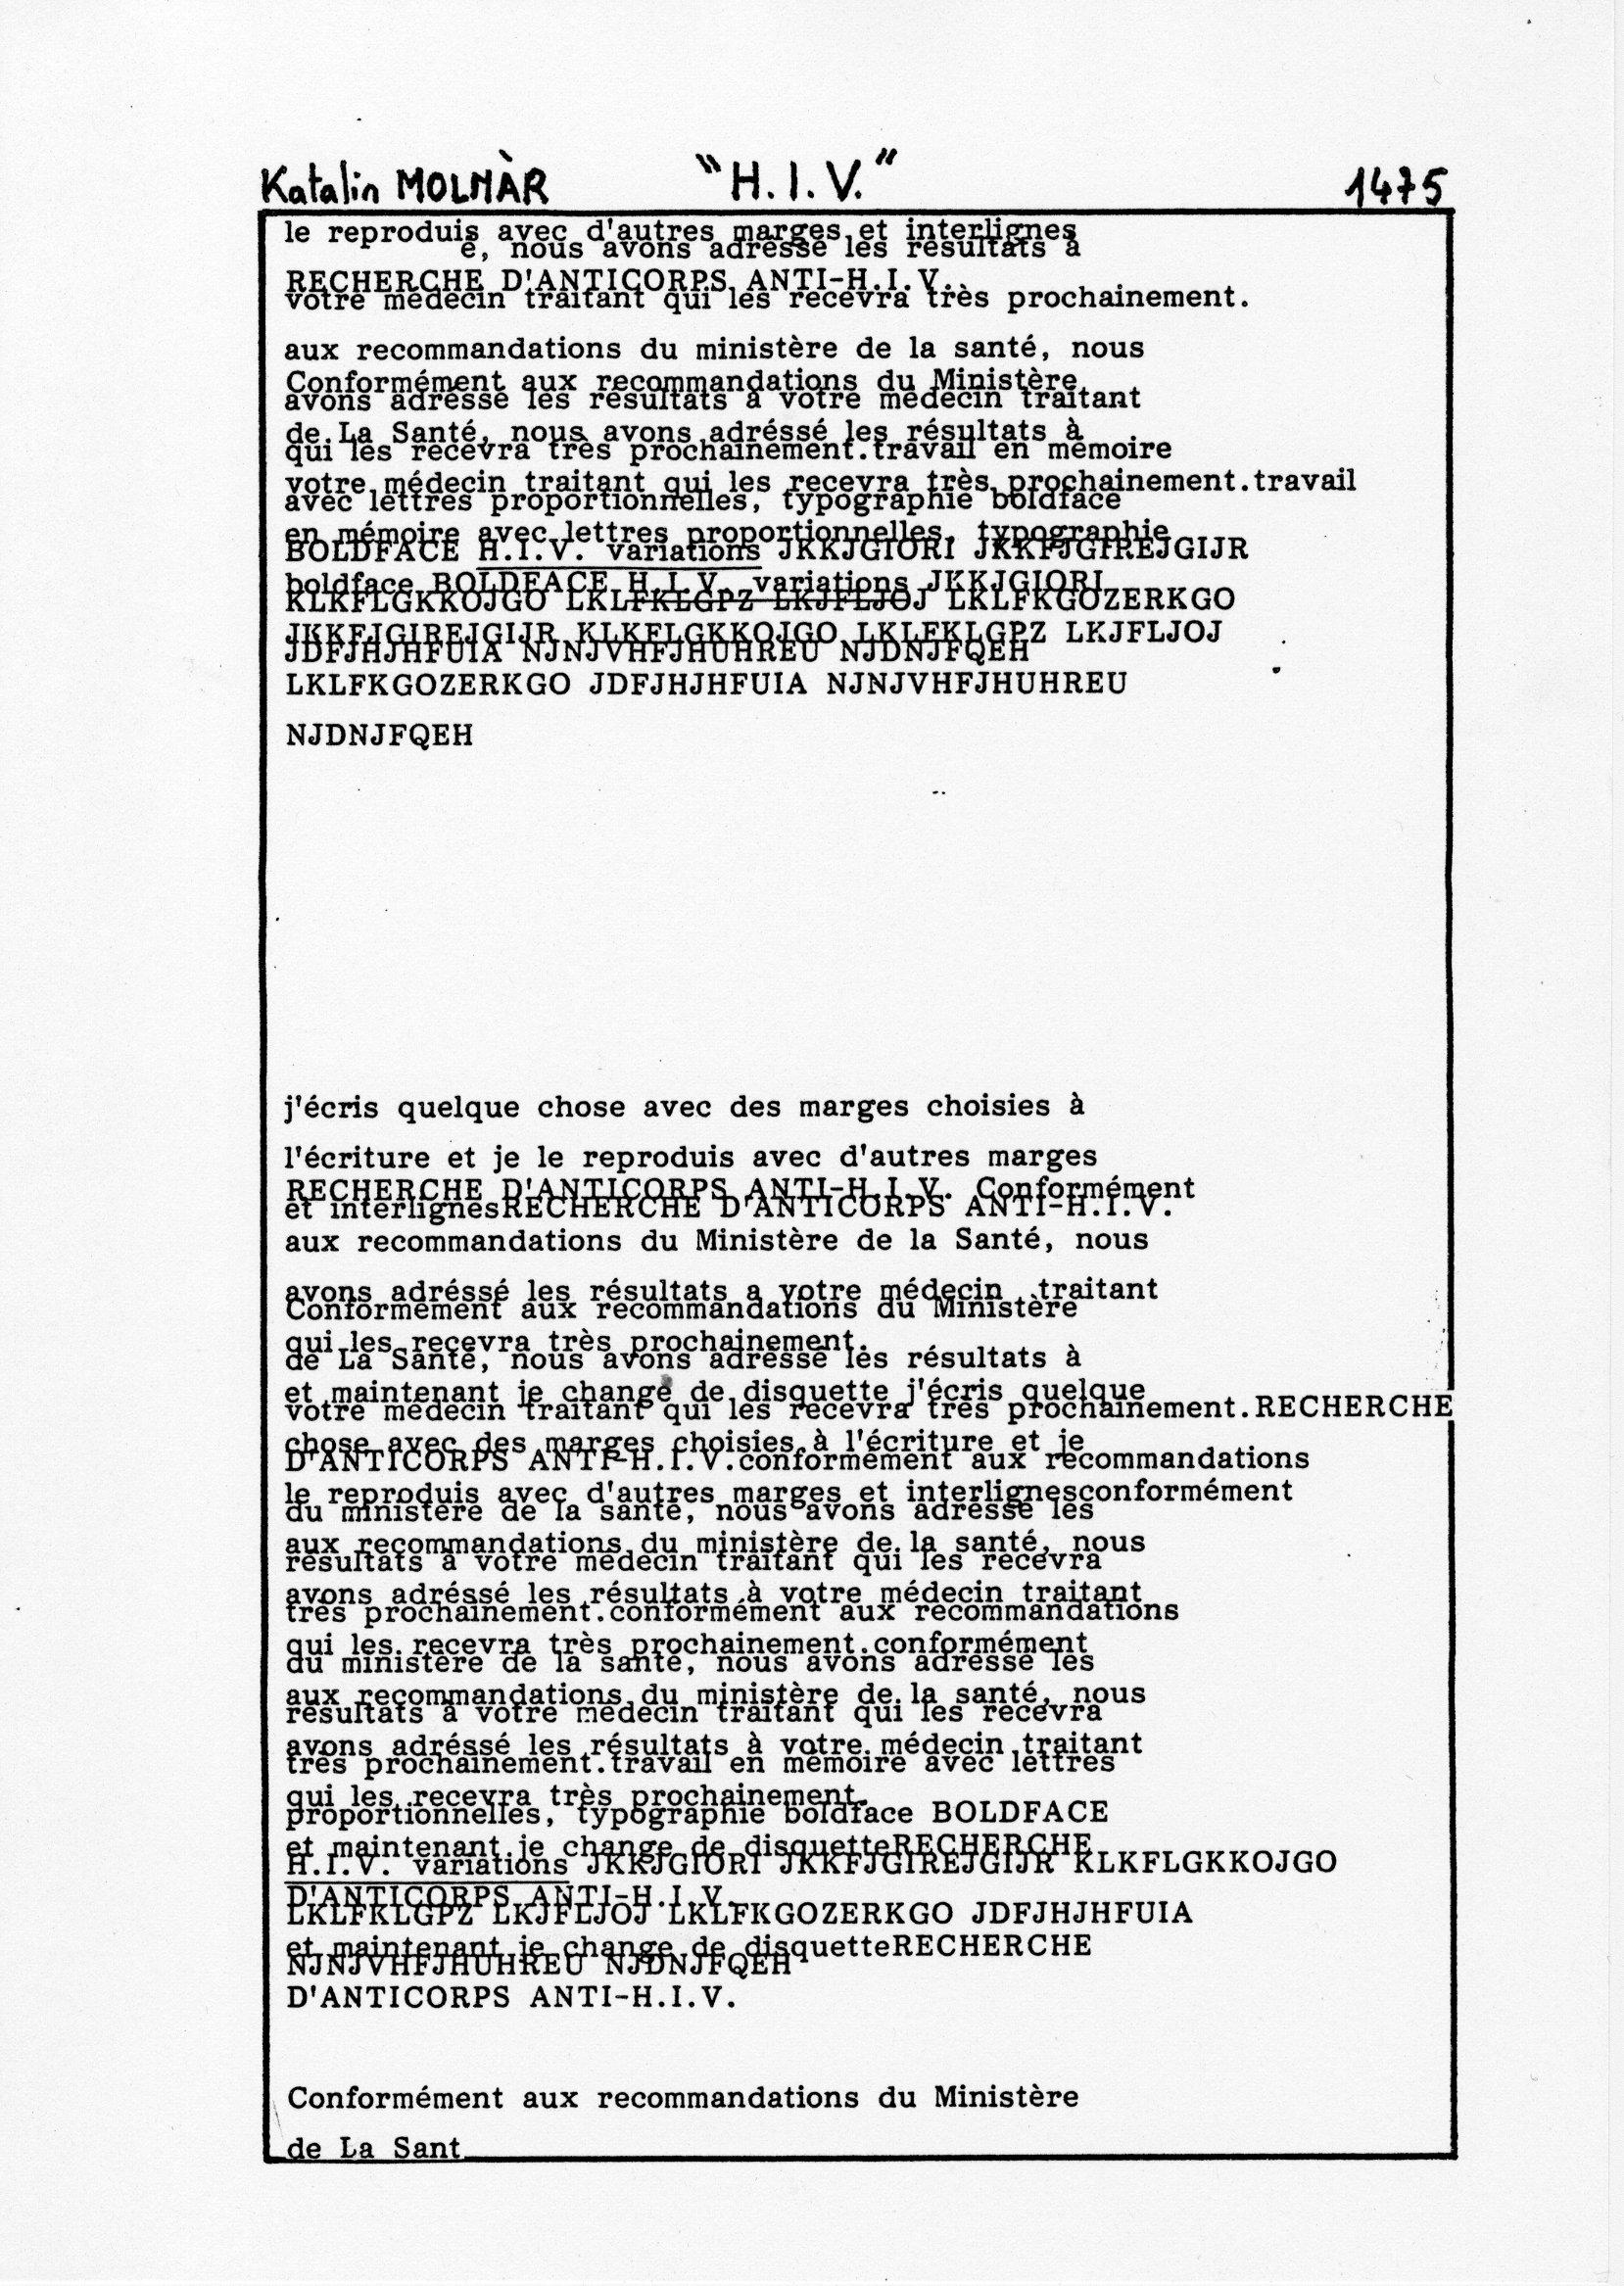 page 1475 K. Molnar H.I.V.